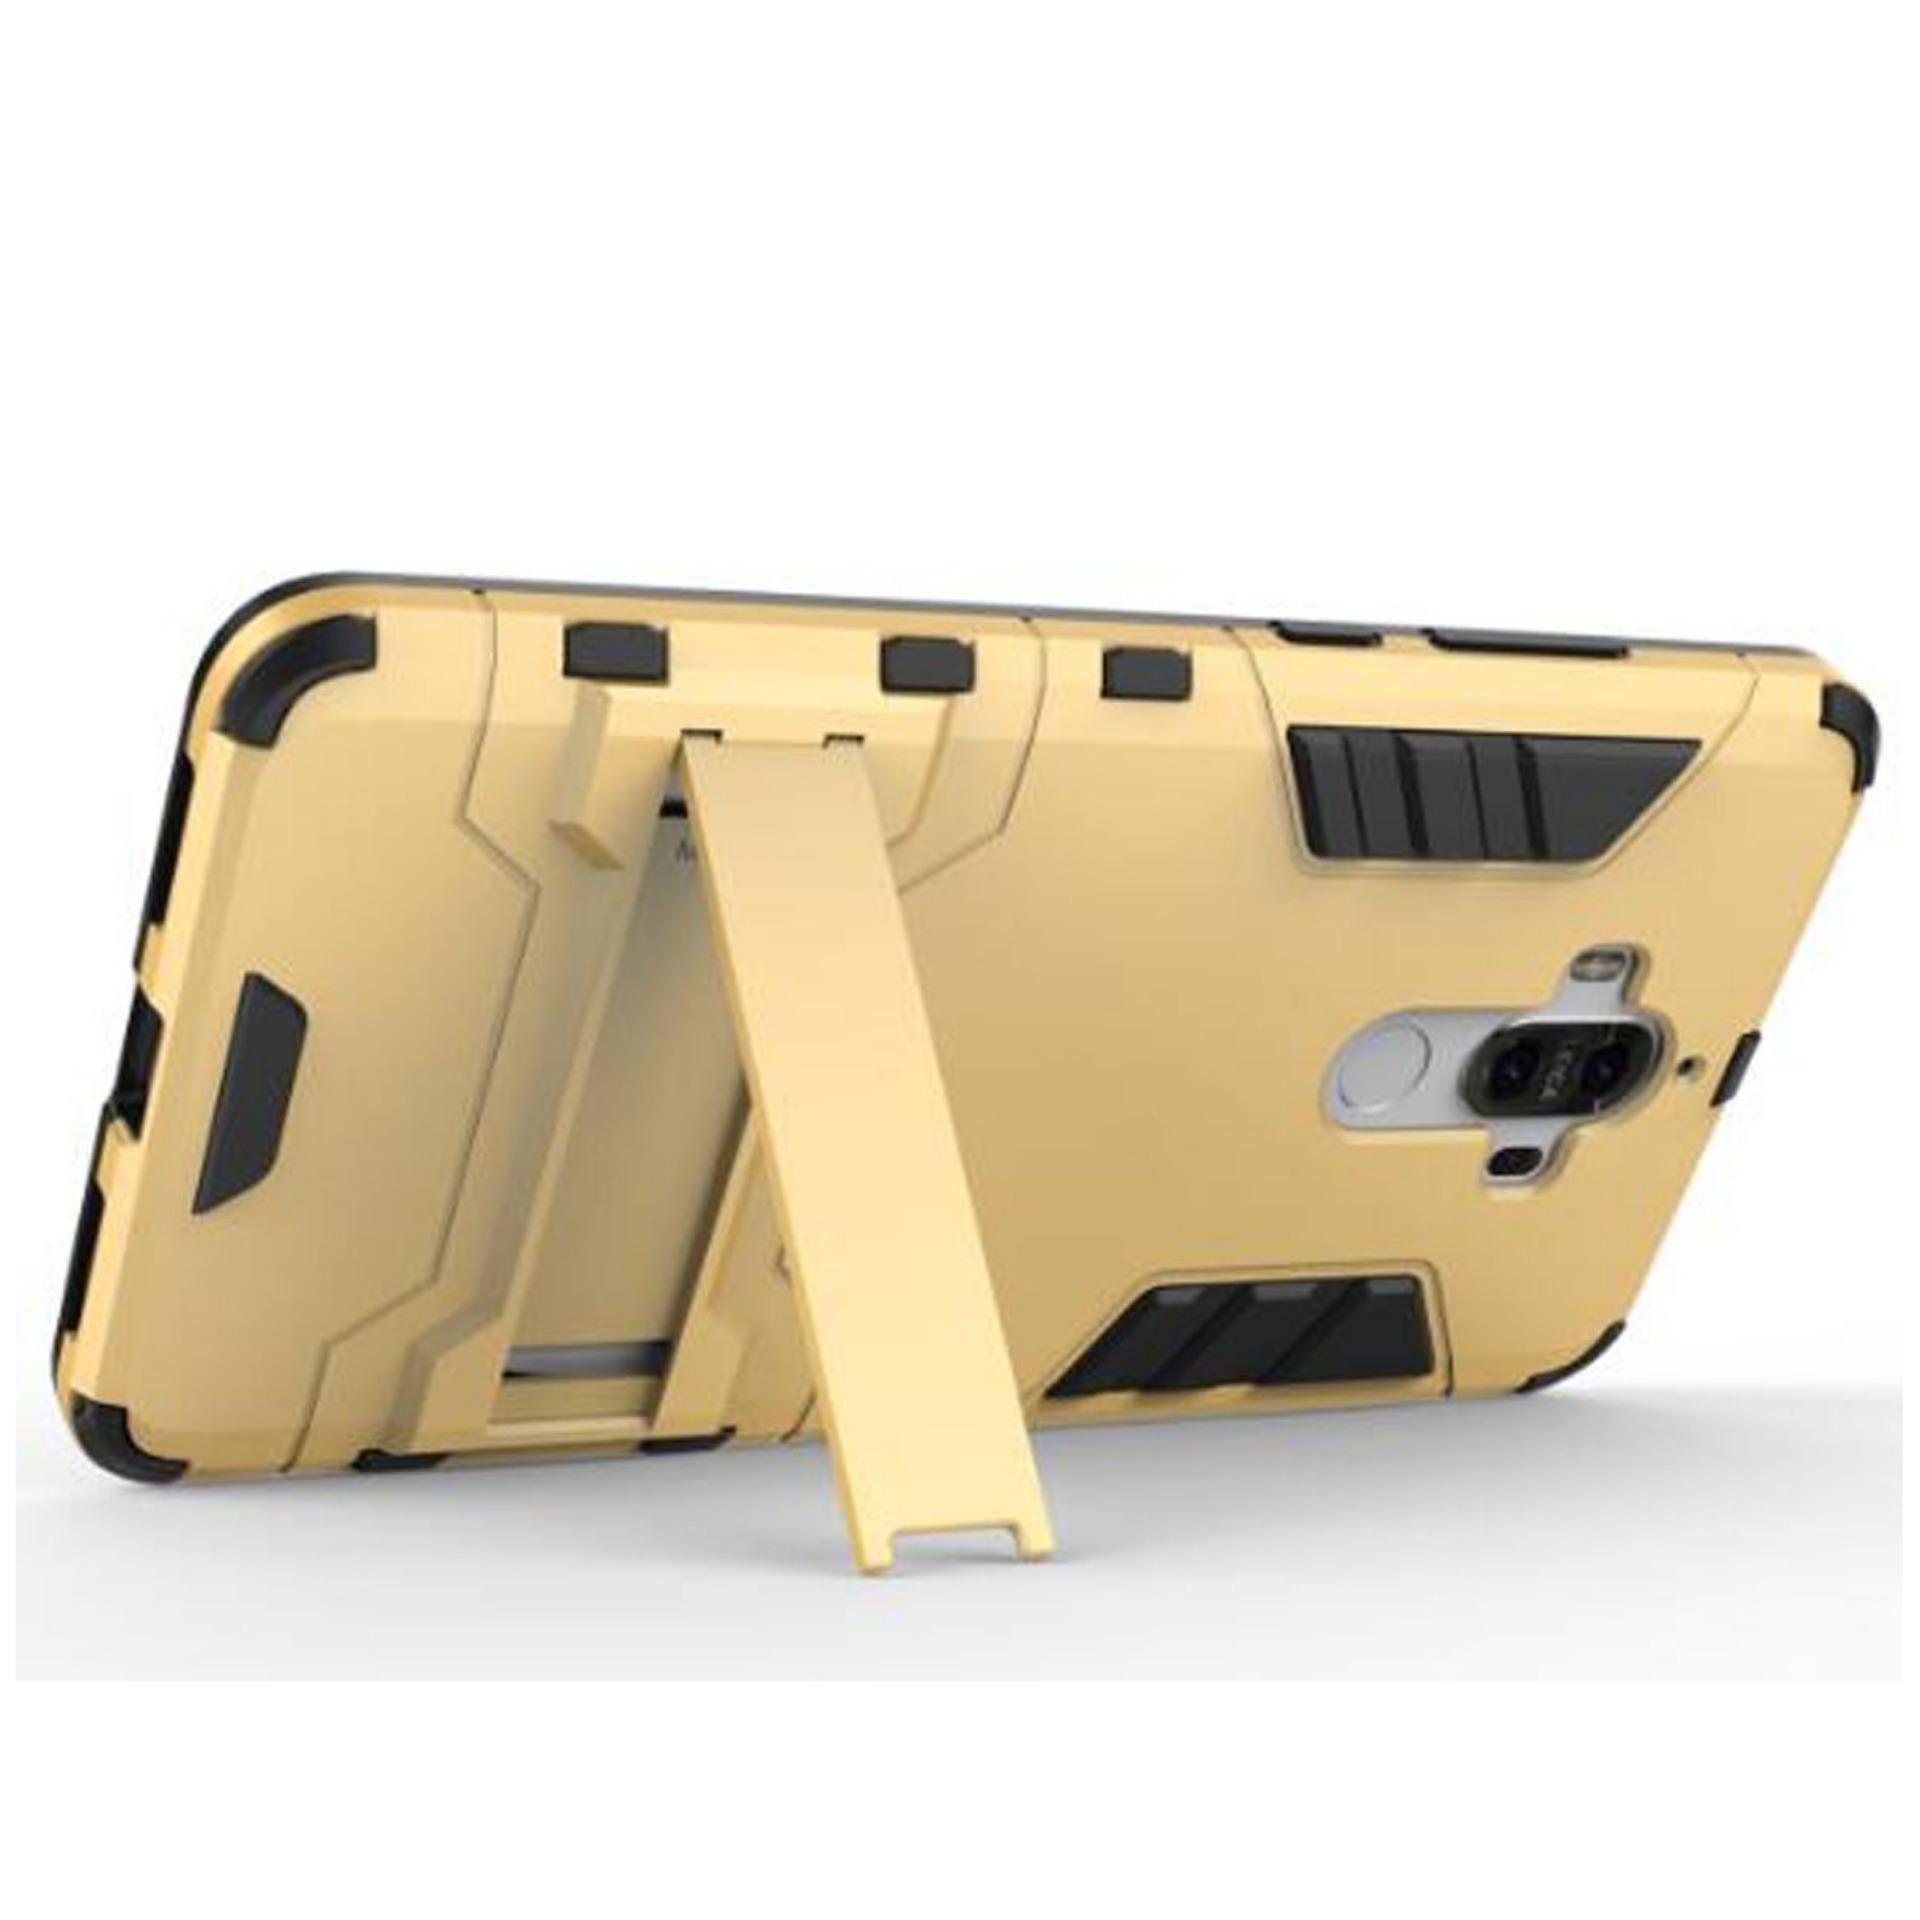 ... Rugged Shockproof Case Cover Dengan Kickstand Untuk Apple IPad 2/3. Source · Hybrid Kickstand Heavy Duty Robot Armor Defender . Source · [ULTRA WAR .